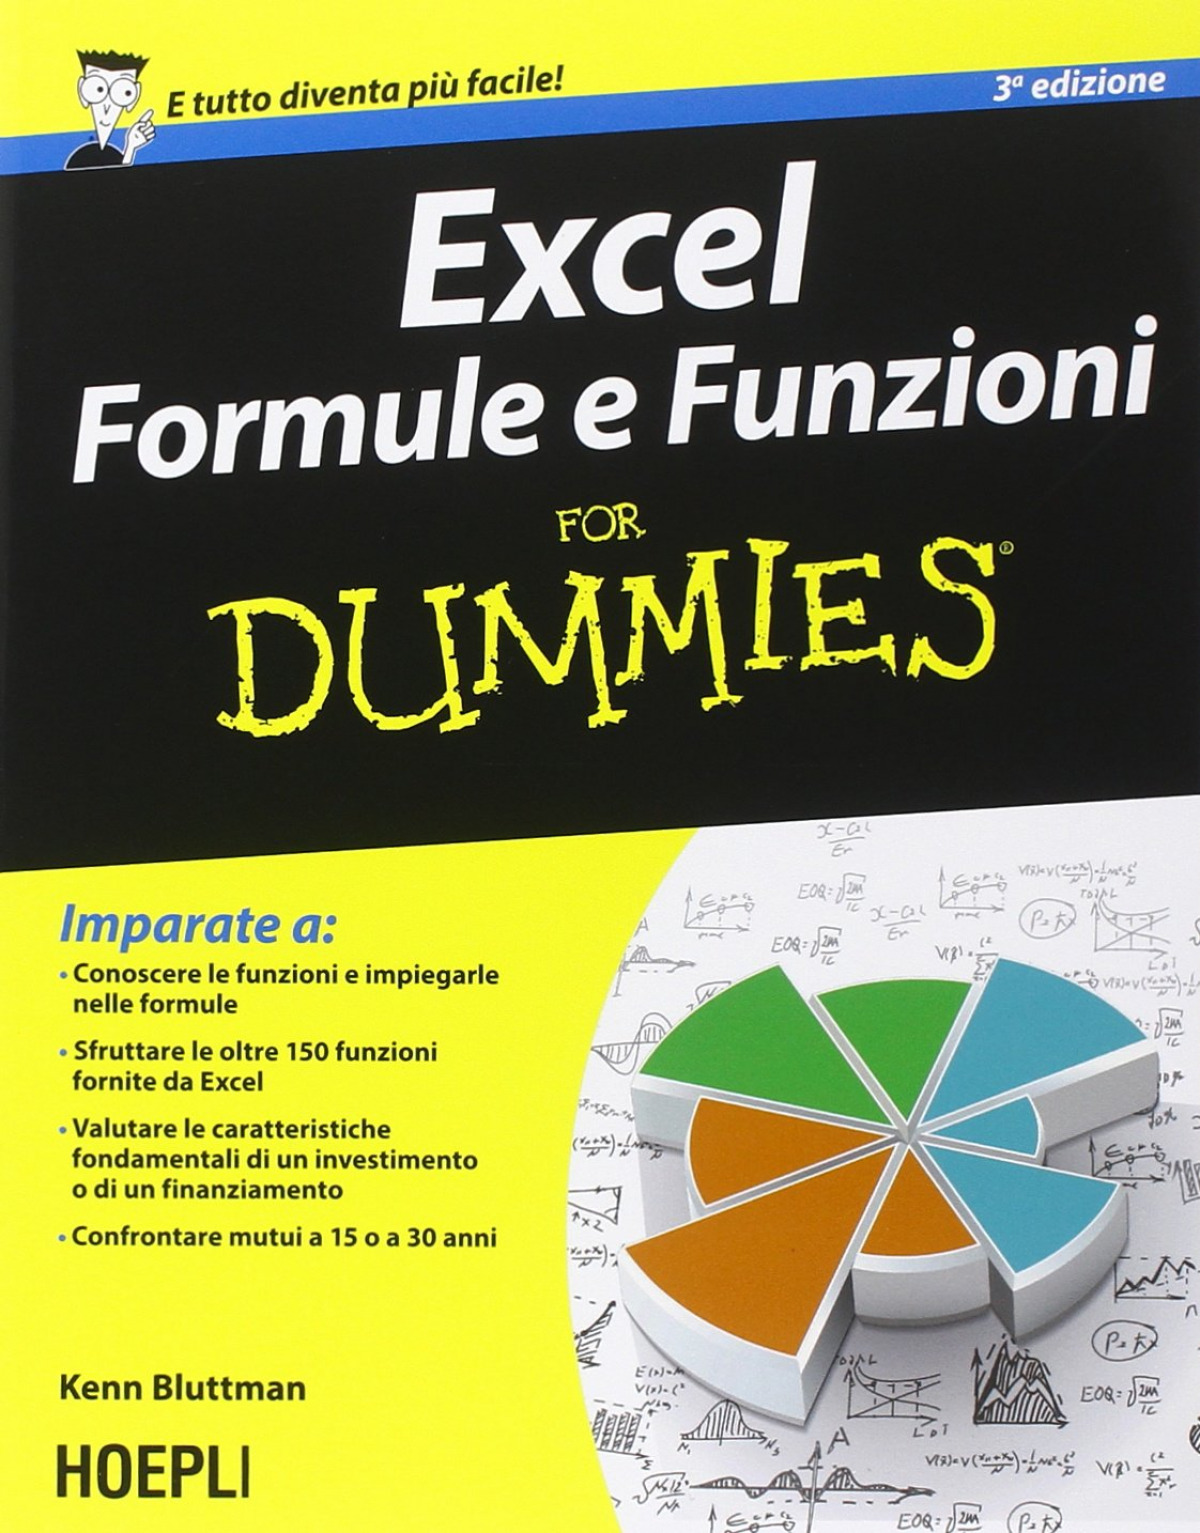 Excel Formule e funzioni For Dummies 9788820363246